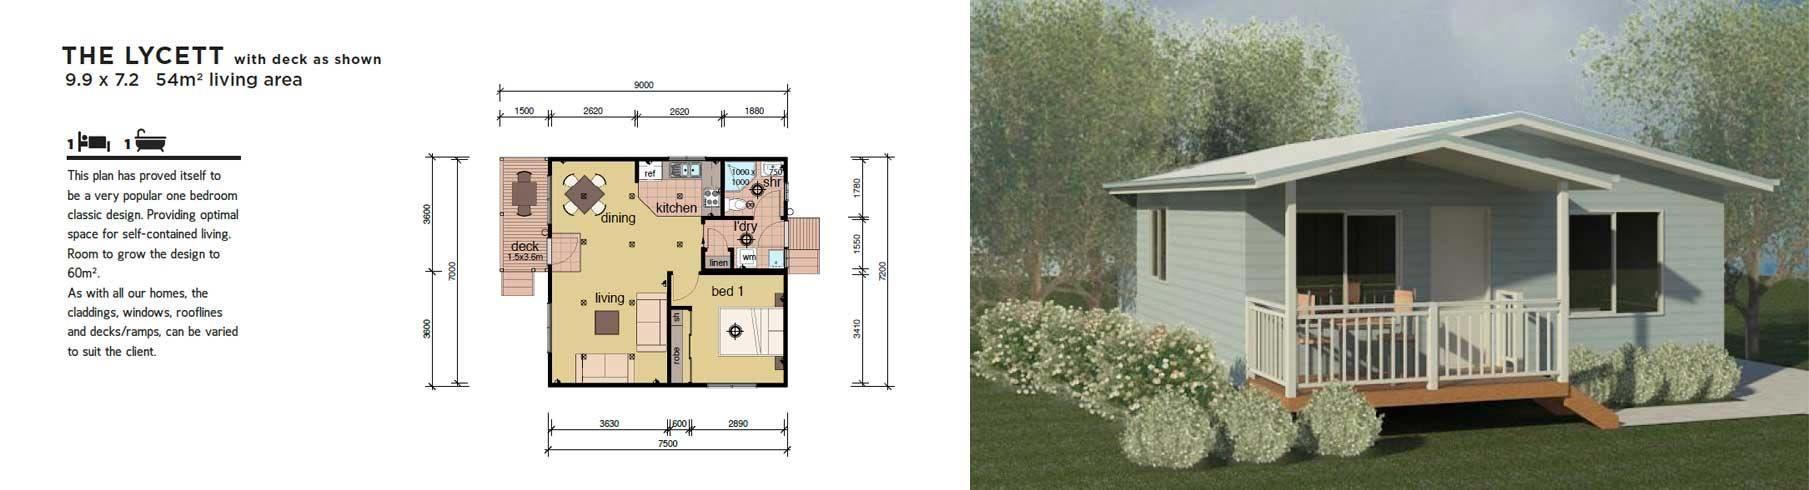 Modular Home The Lycett 1 Bedroom Granny Flat